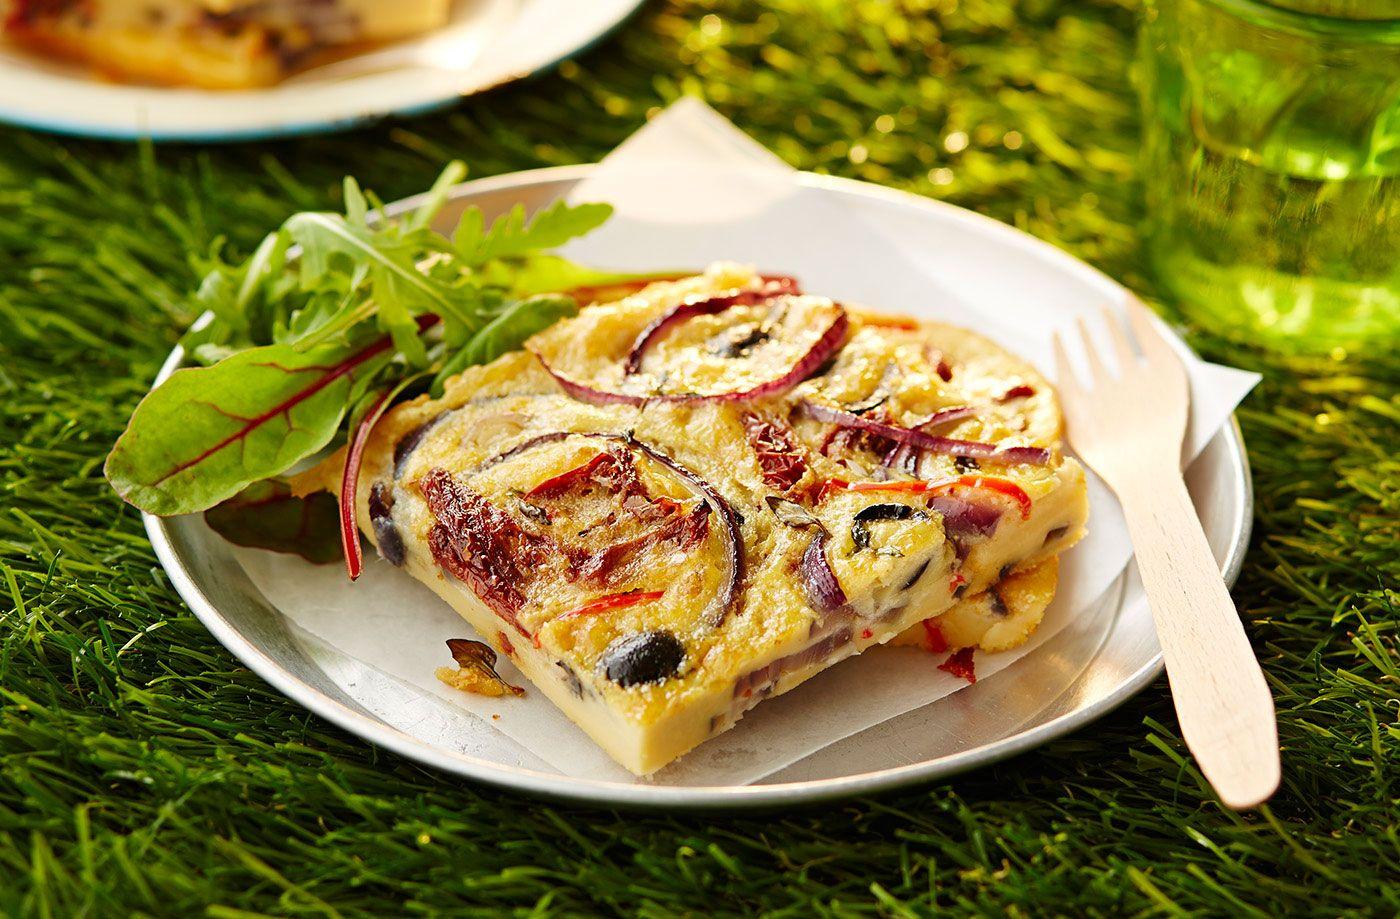 Farinata recipe with images tesco real food recipes